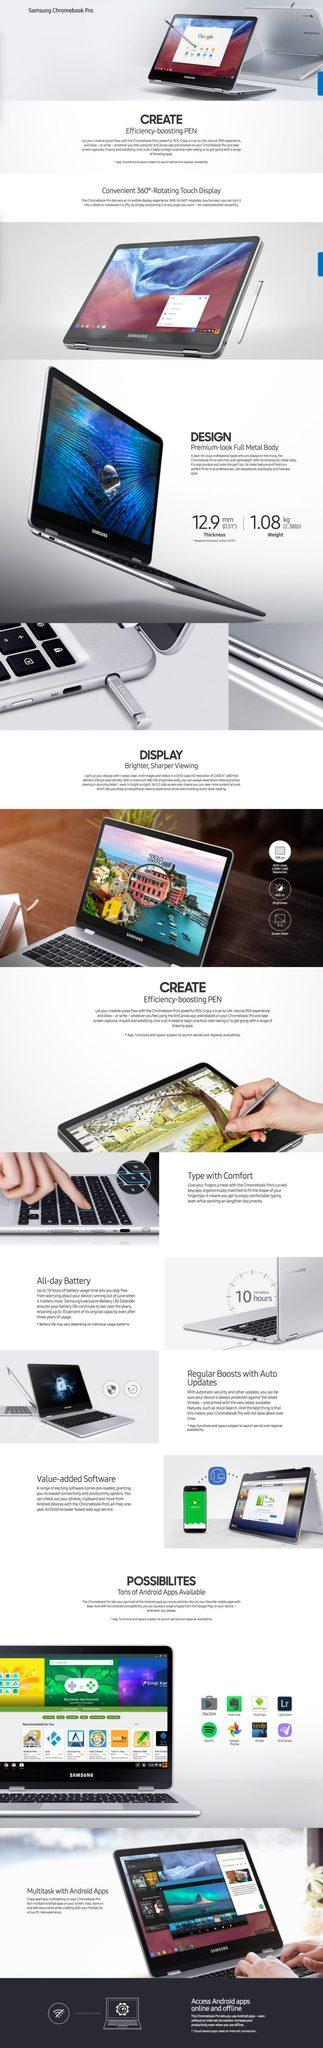 SamsungChrombookProPage-840x5322 (1)